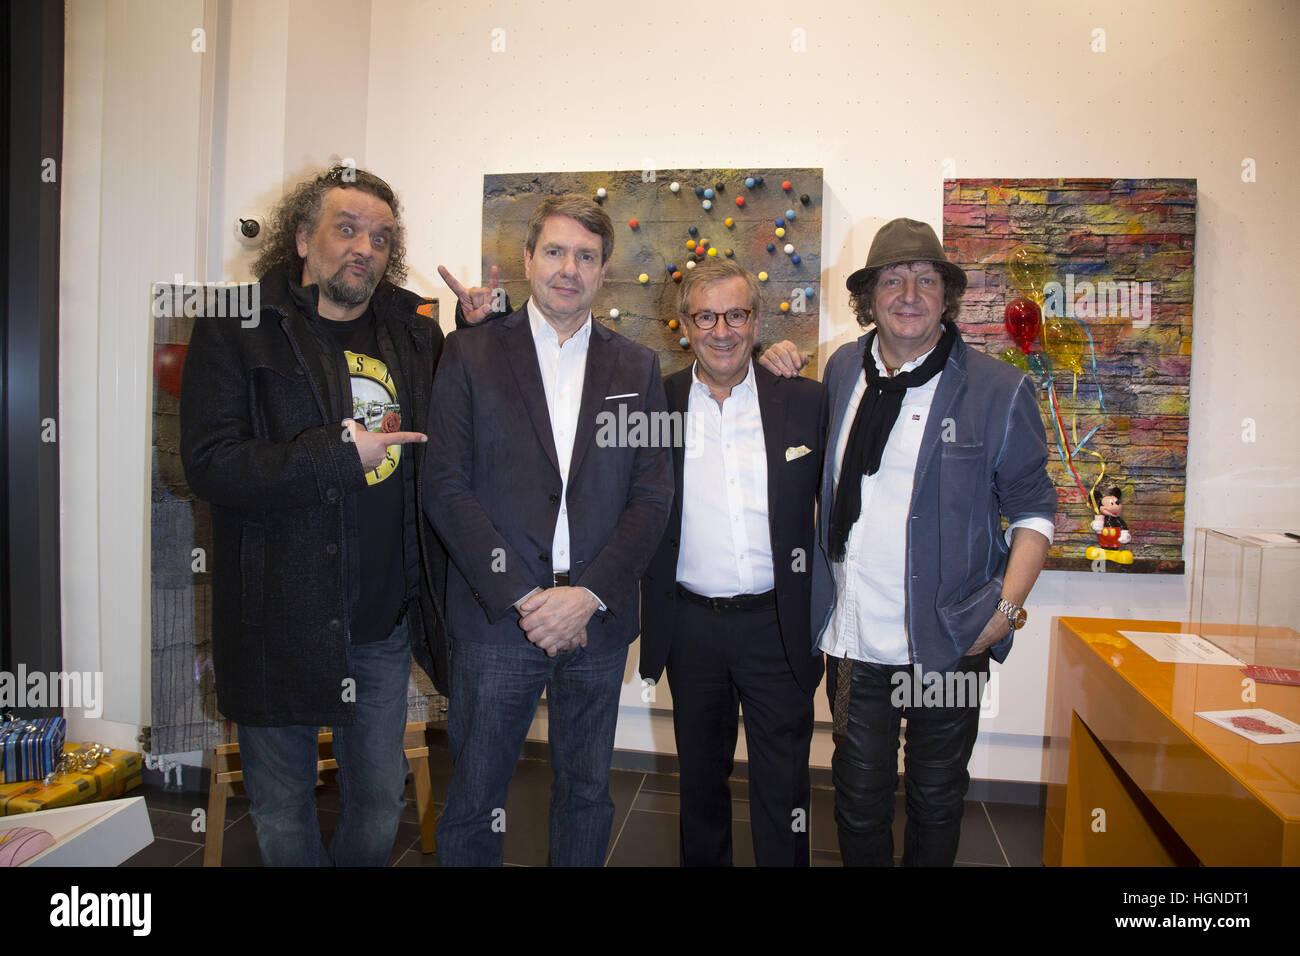 Galerie Mensing Hamburg for help galerie mensing hamburg presents the pop duo